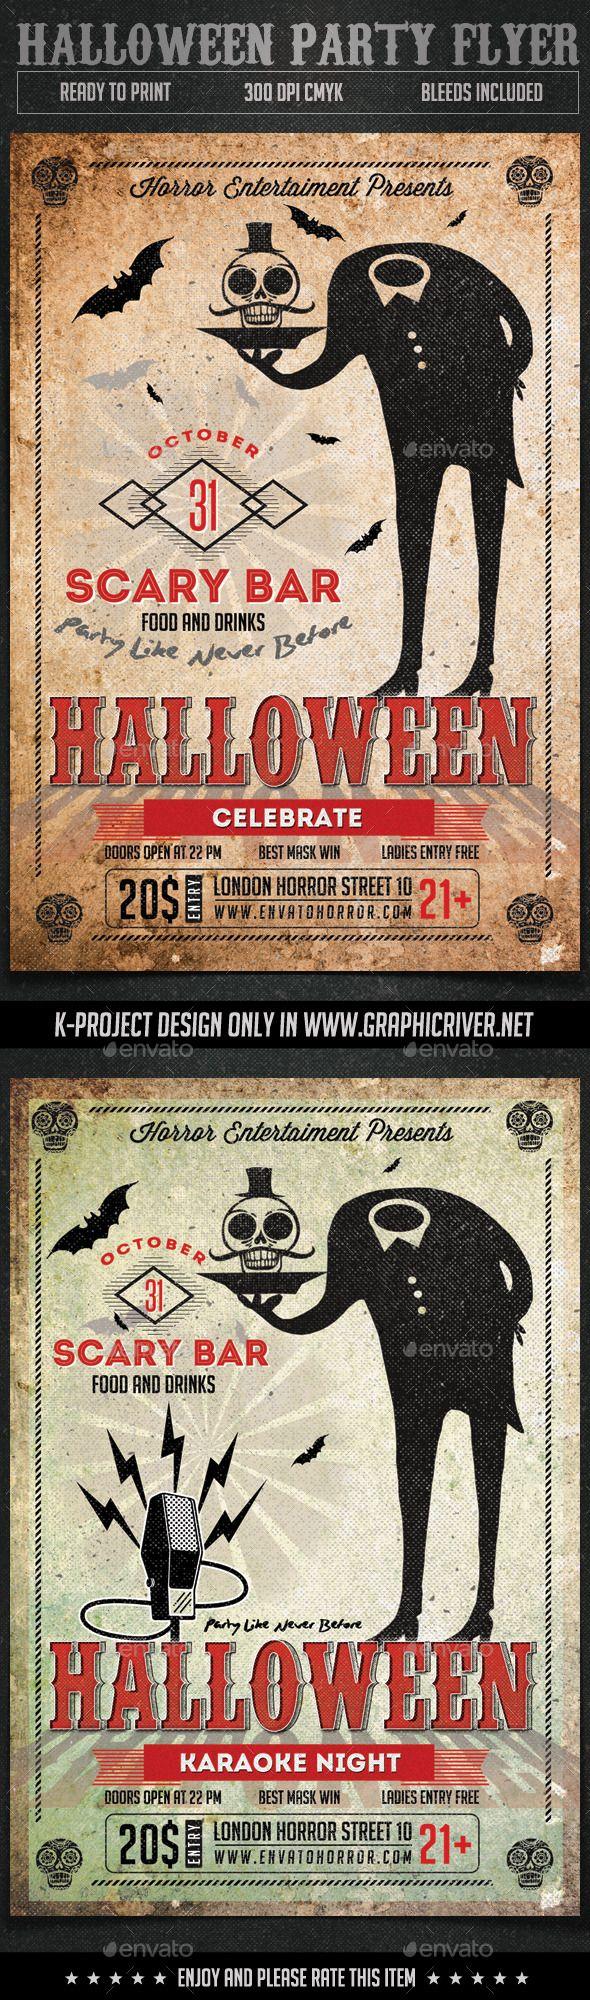 Halloween Party Flyer Template PSD #design Download: http://graphicriver.net/item/halloween-party-flyer/12955145?ref=ksioks